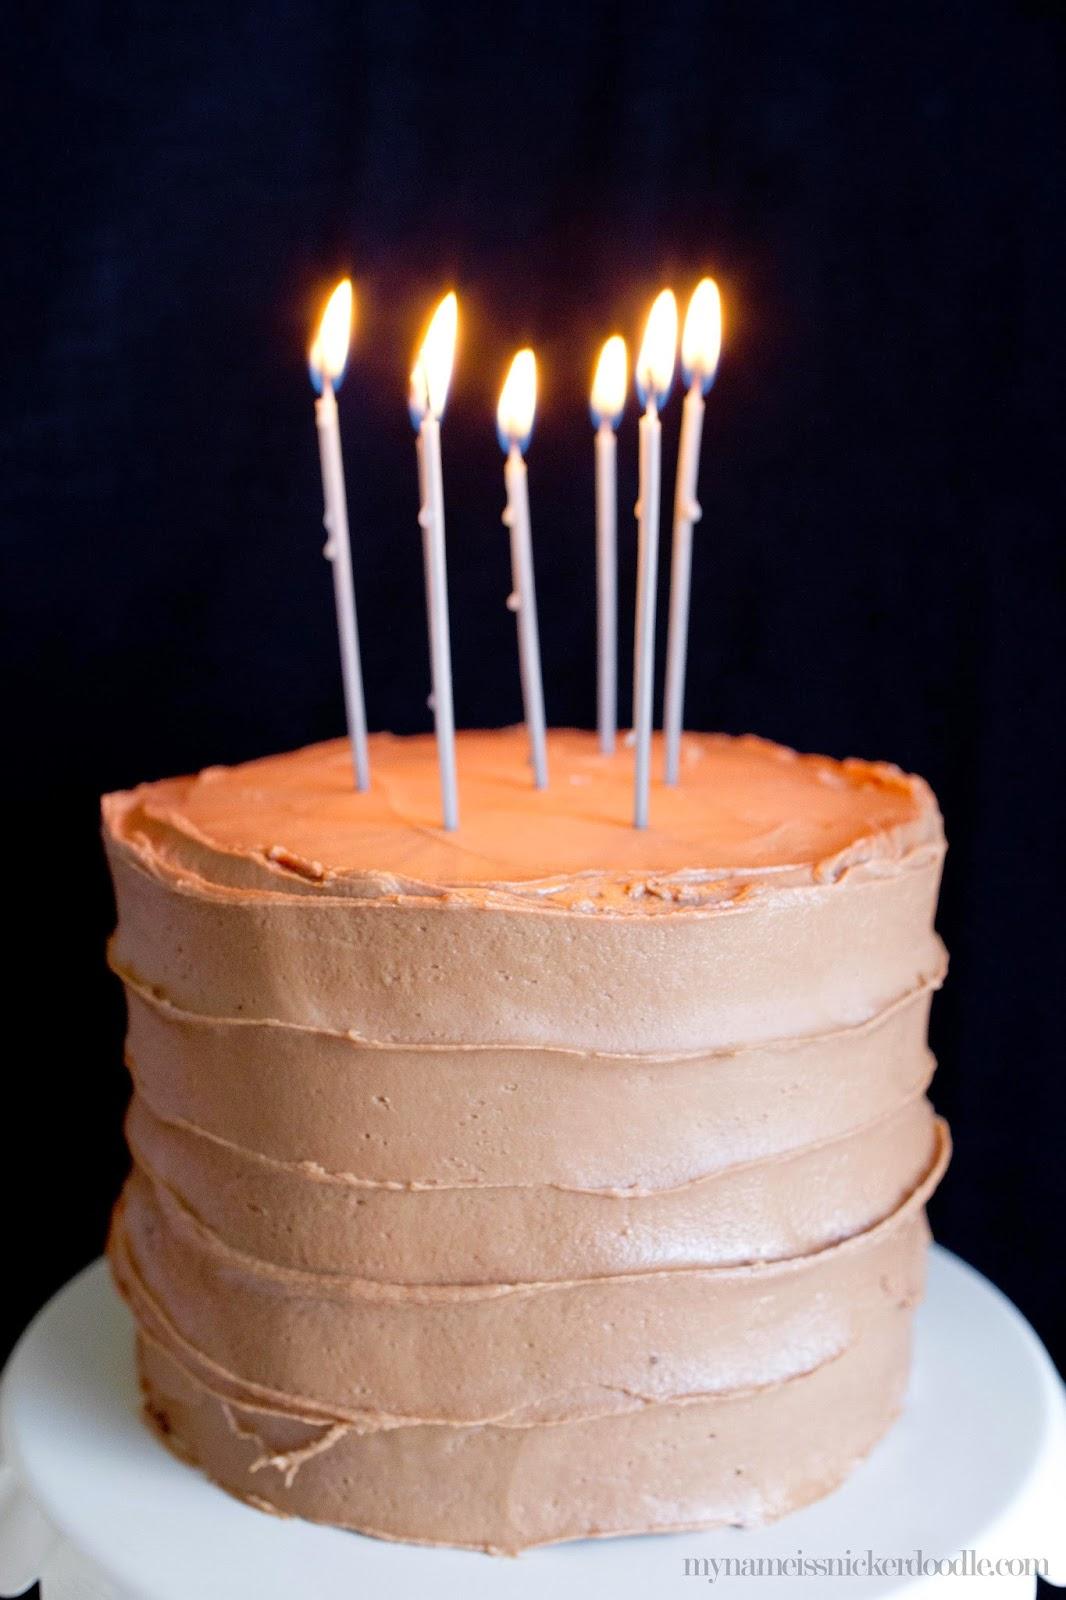 Homemade Birthday Cake Ice Cream My Name Is Snickerdoodle